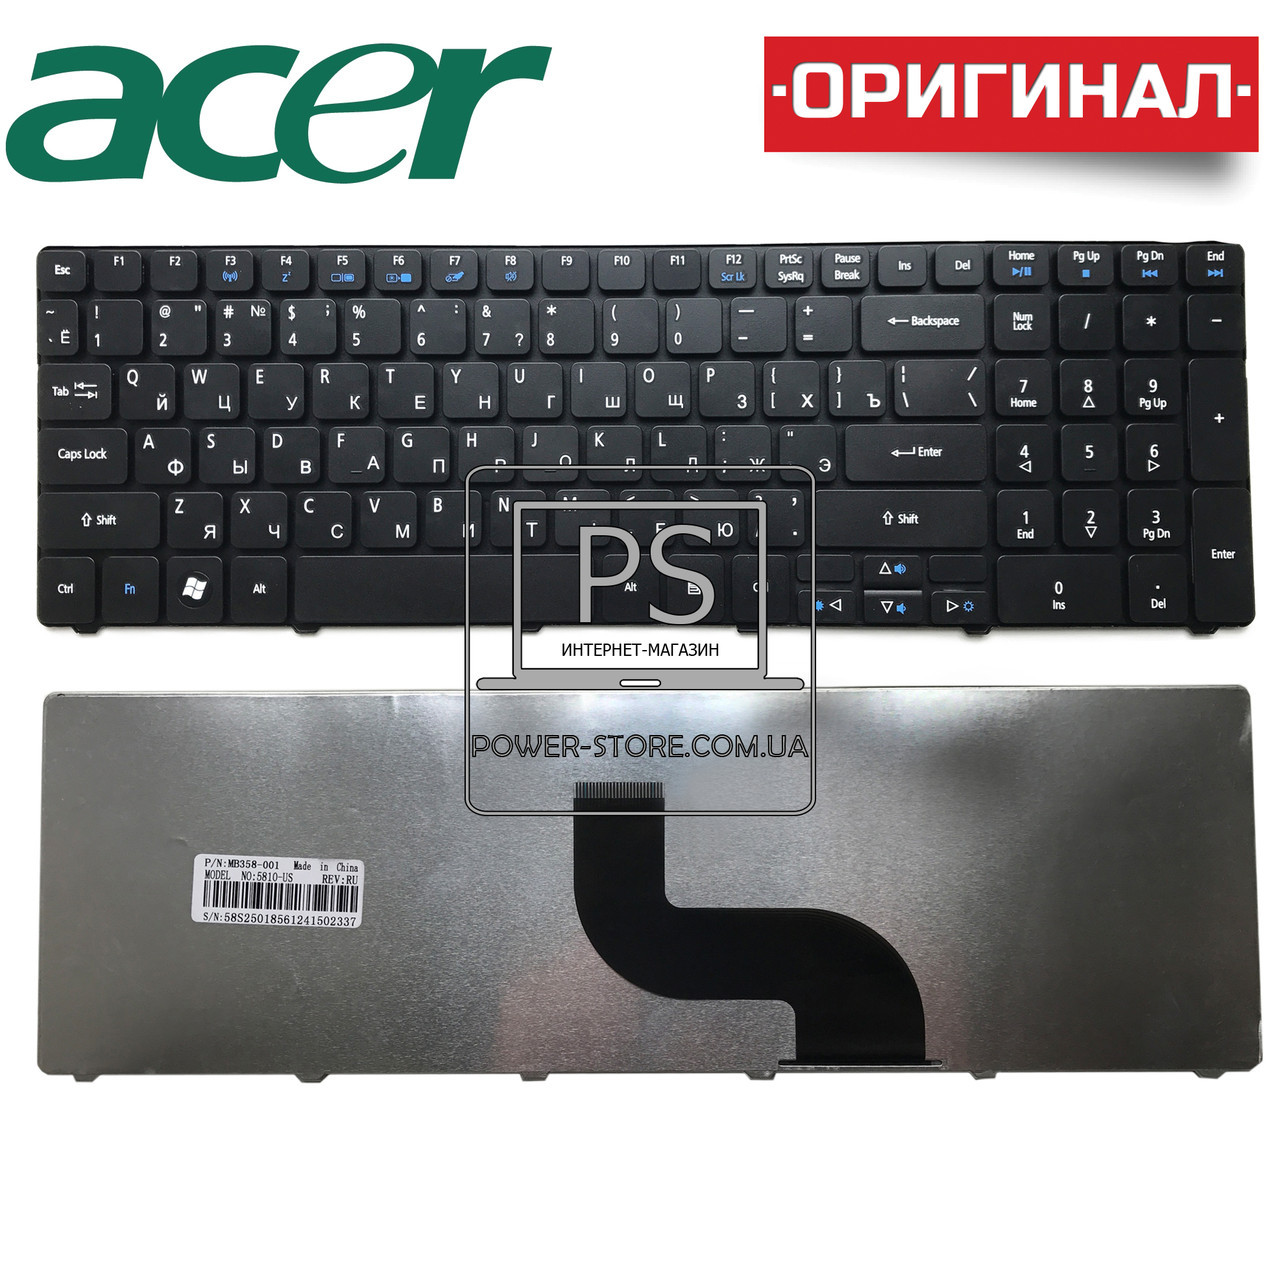 Клавиатура  для ноутбука ACER  Aspire 7250G, Aspire 7336, Aspire 7340, Aspire 7340G,